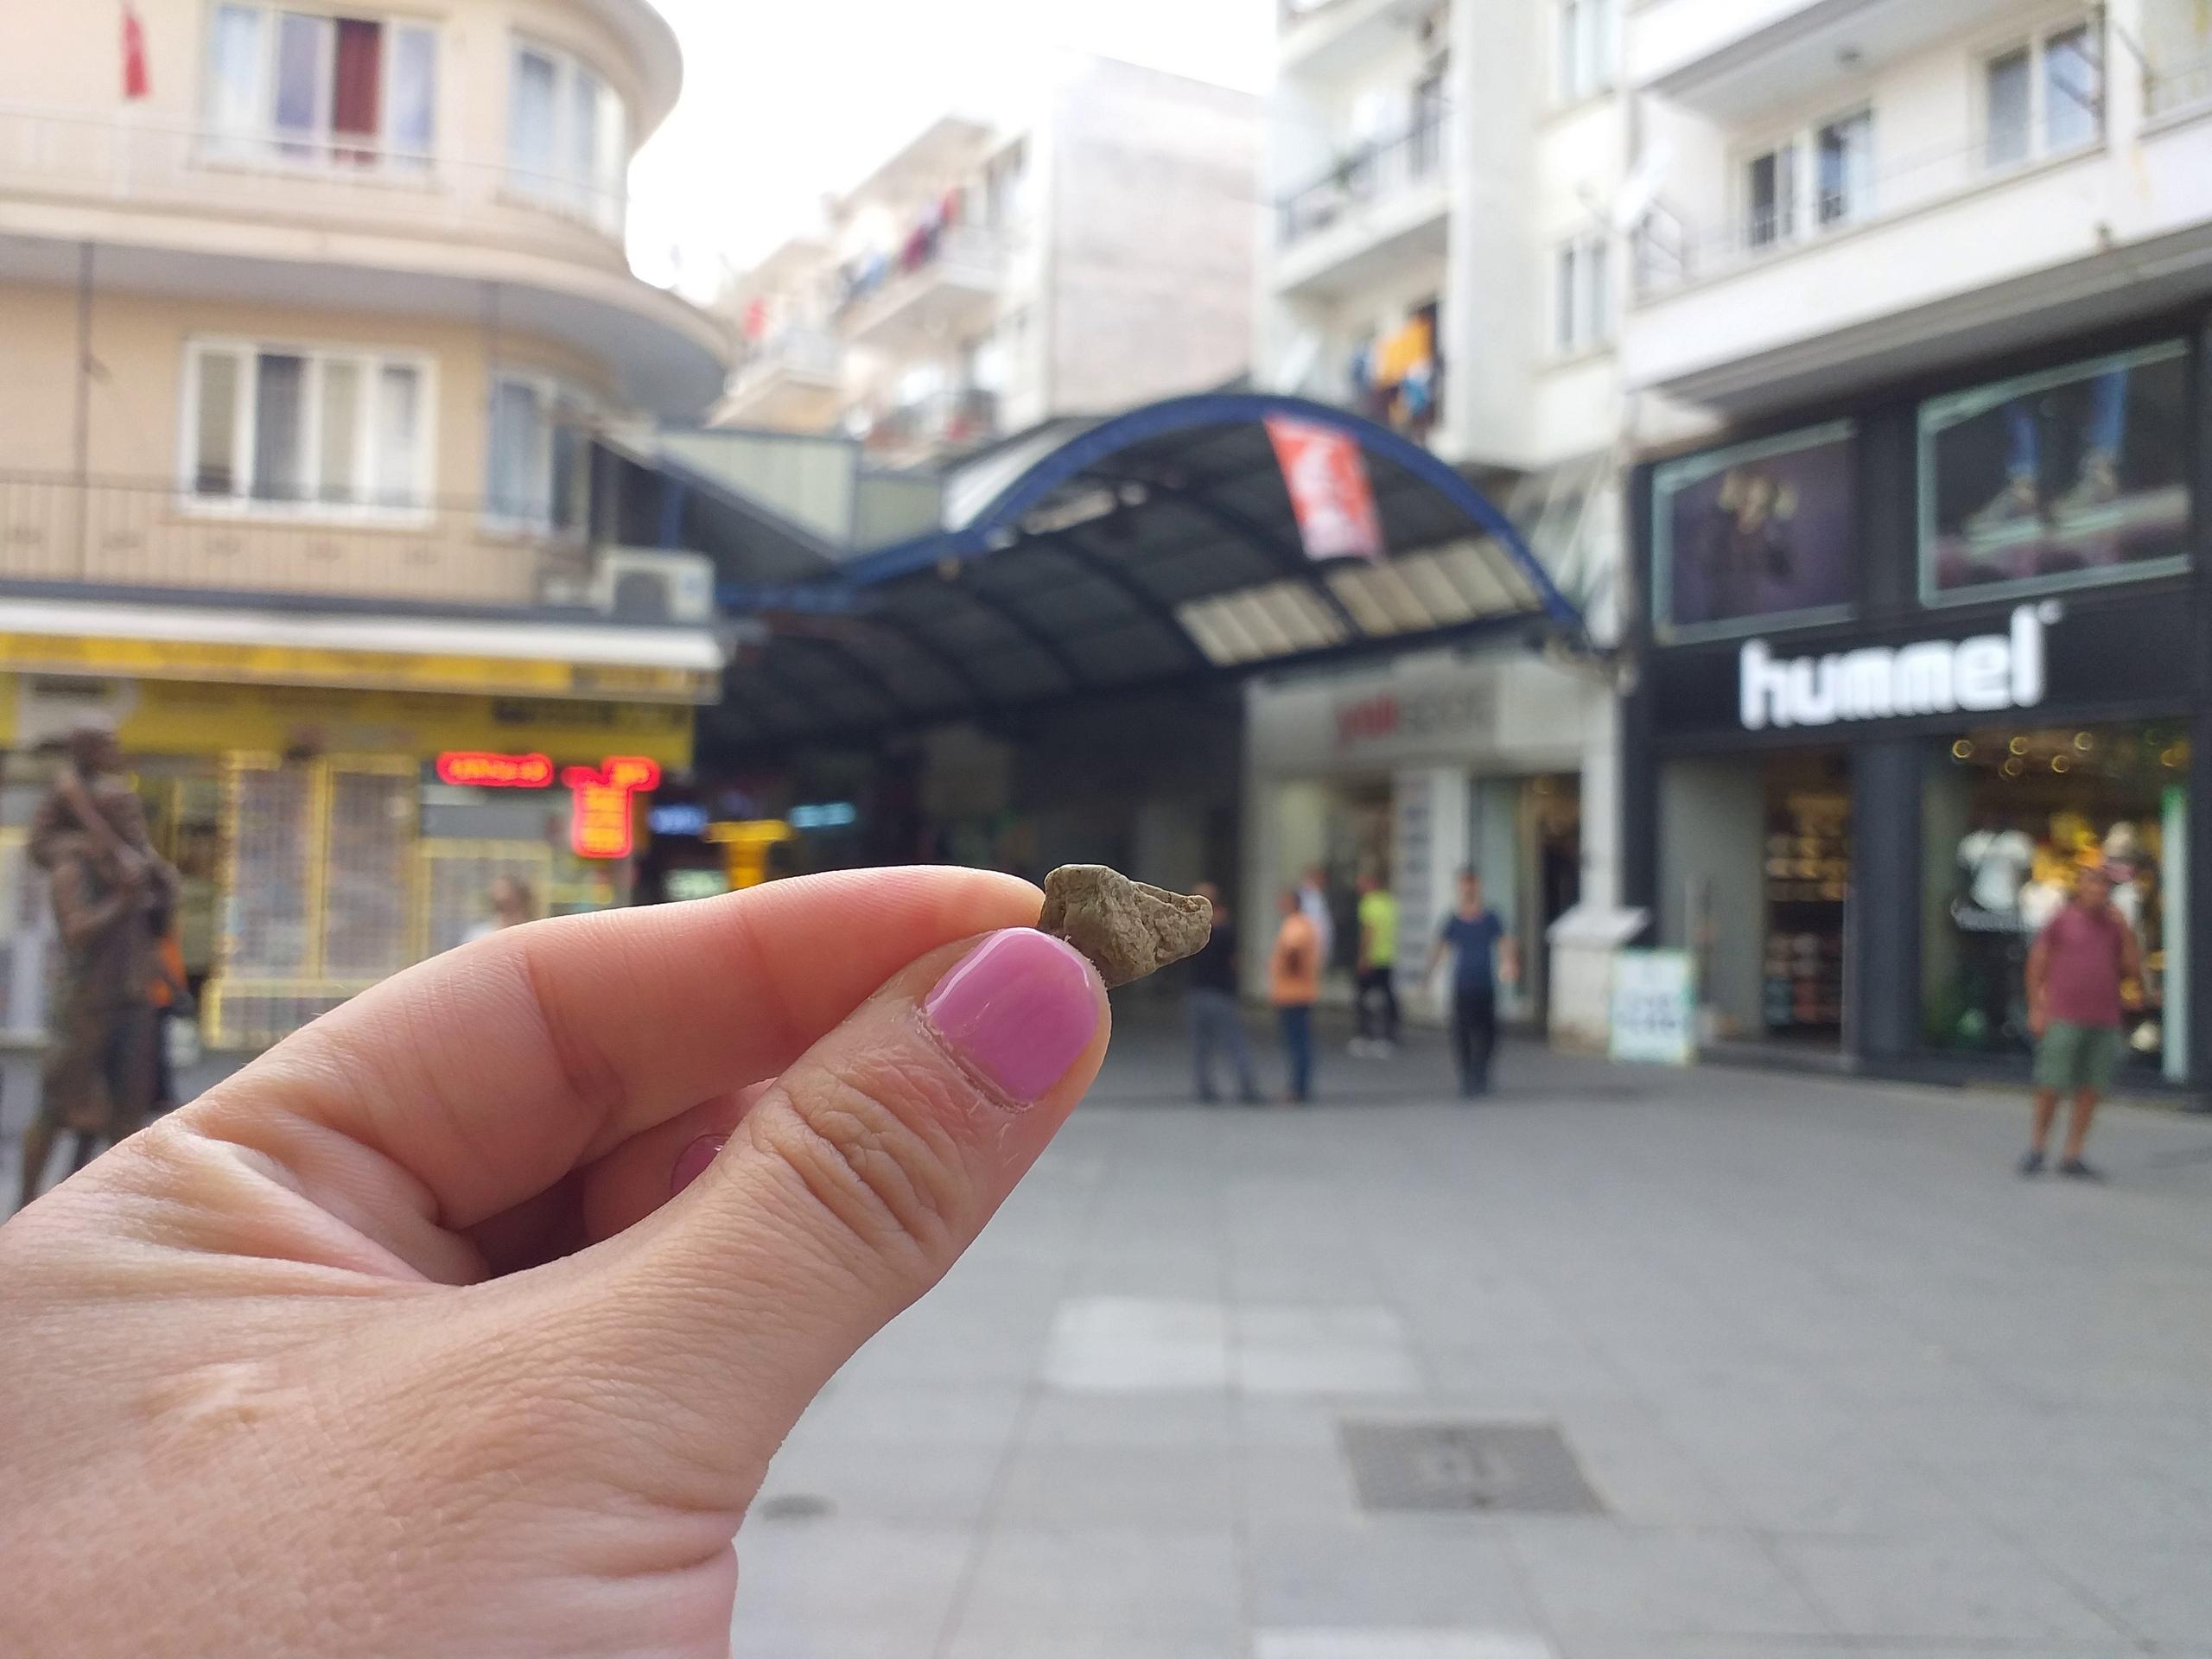 Елена Руденко ( Валтея). Мои путешествия. Турция. Мармарис. (фото ). 021GYPMjyZE